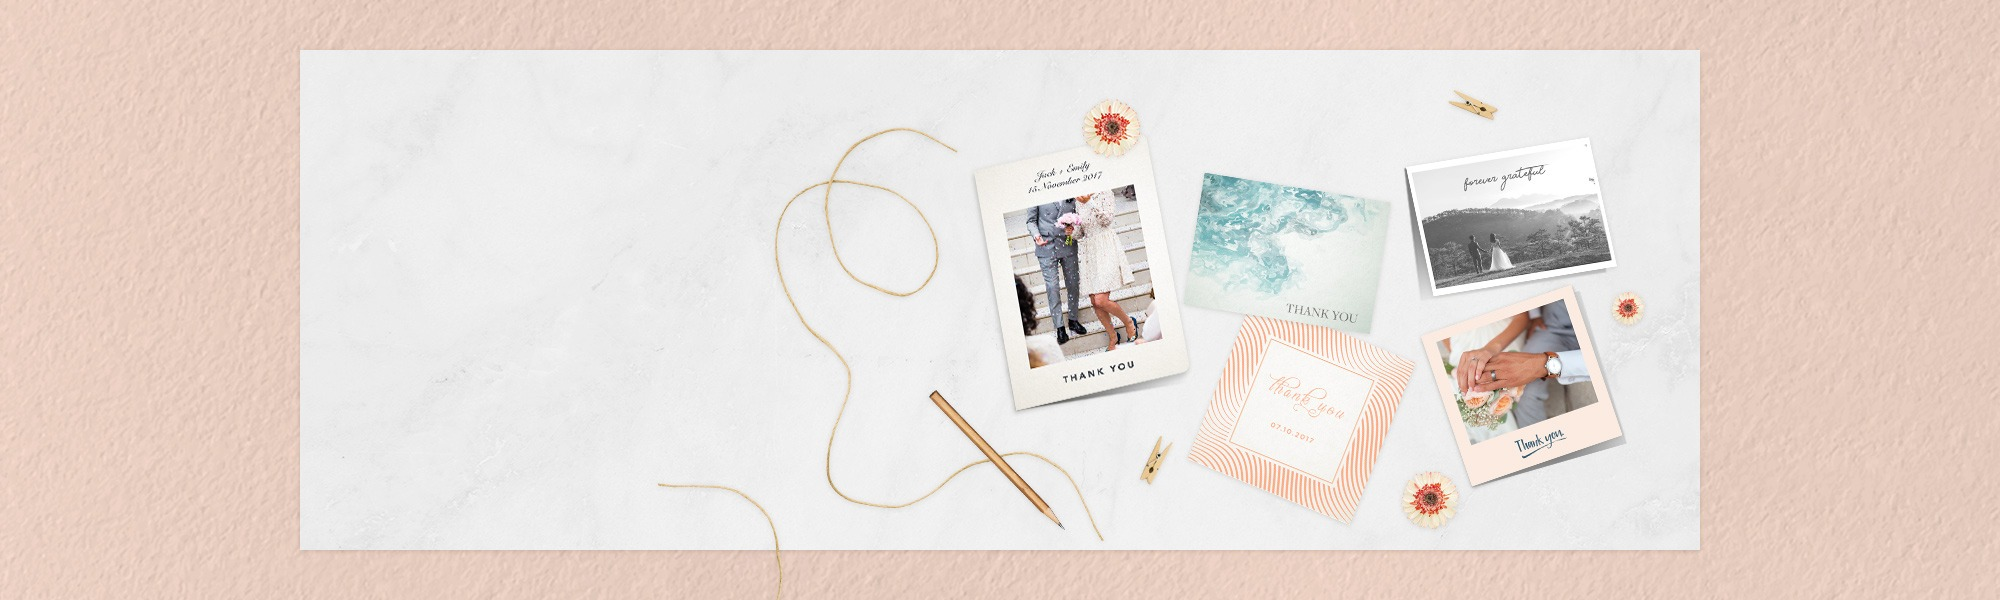 wedding thankyou photo cards